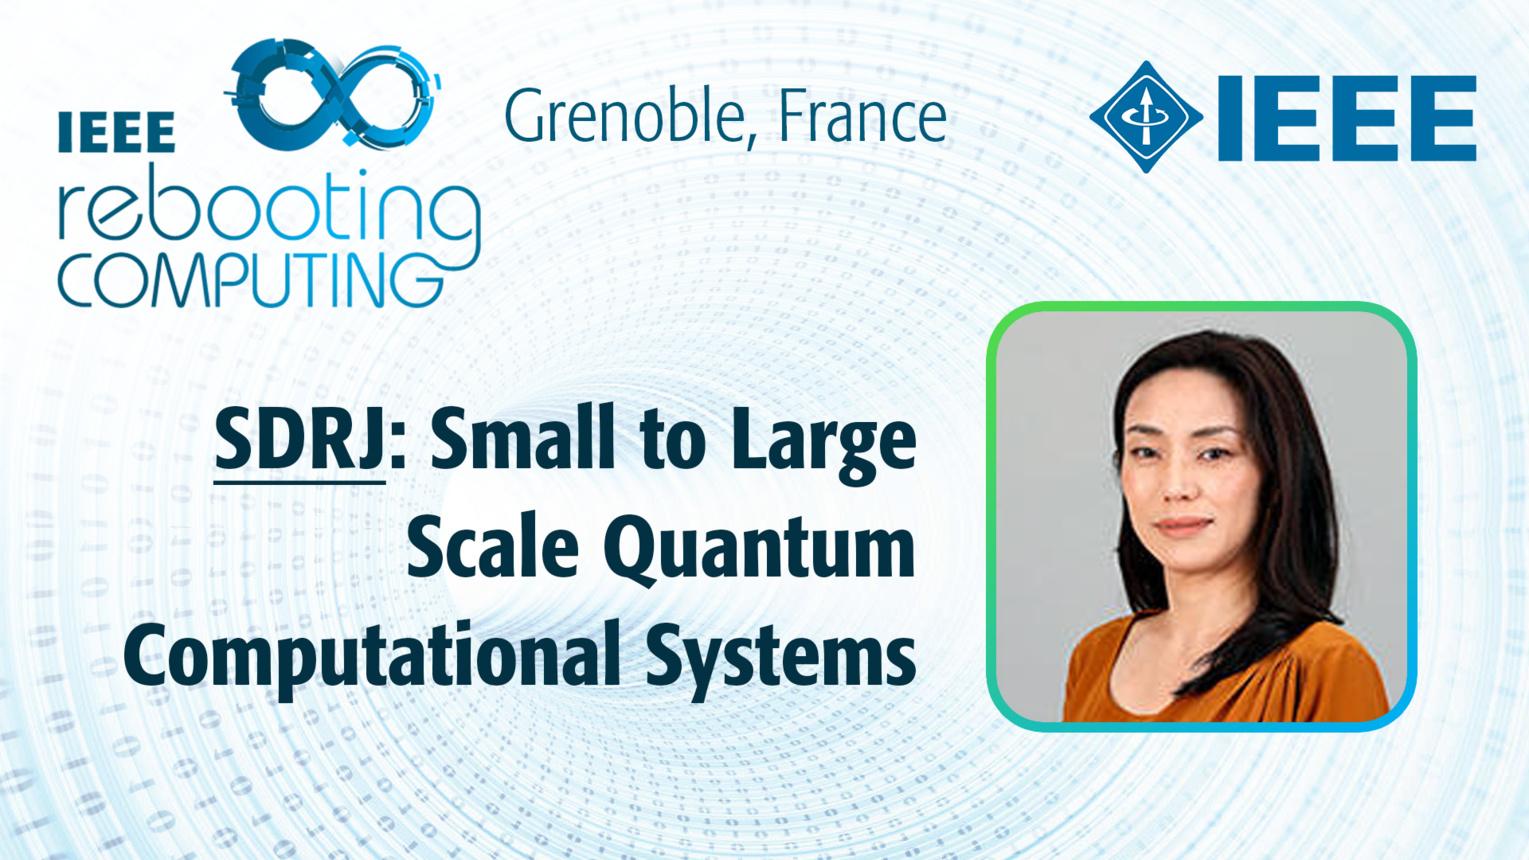 SDRJ: Small to Large Scale Quantum Computational Systems - Kae Nemoto at INC 2019